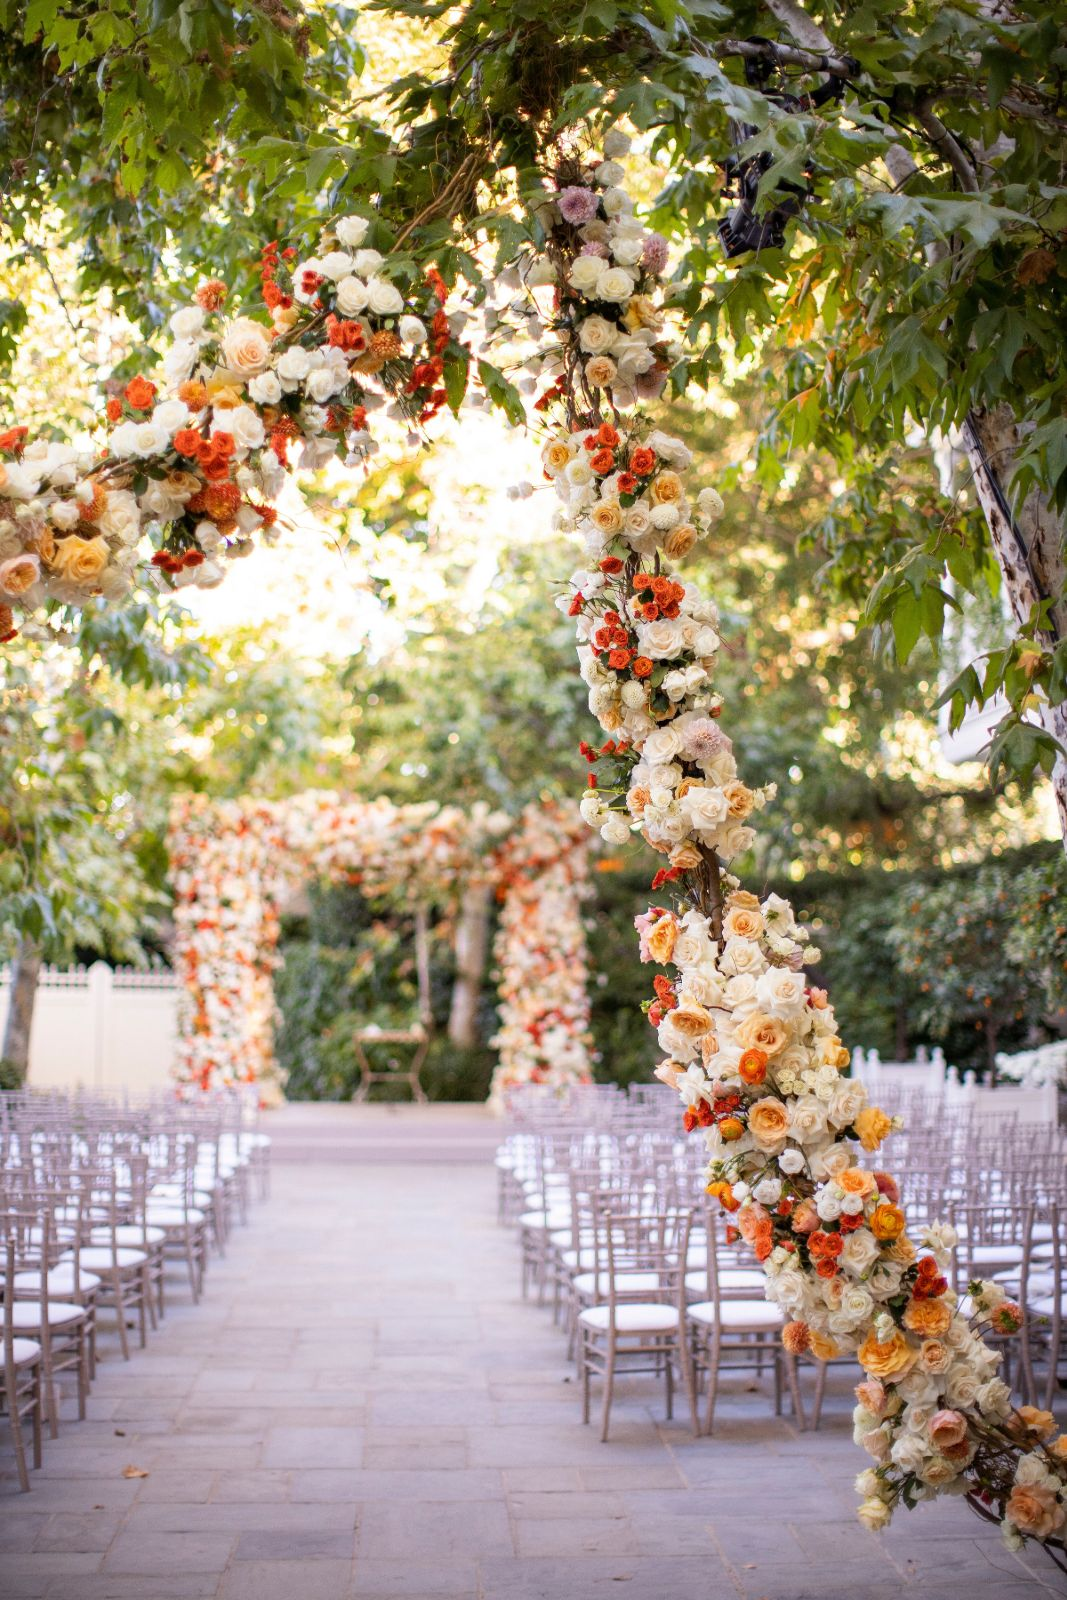 Fall Wedding Ceremony Decor Ideas Mindy Weiss